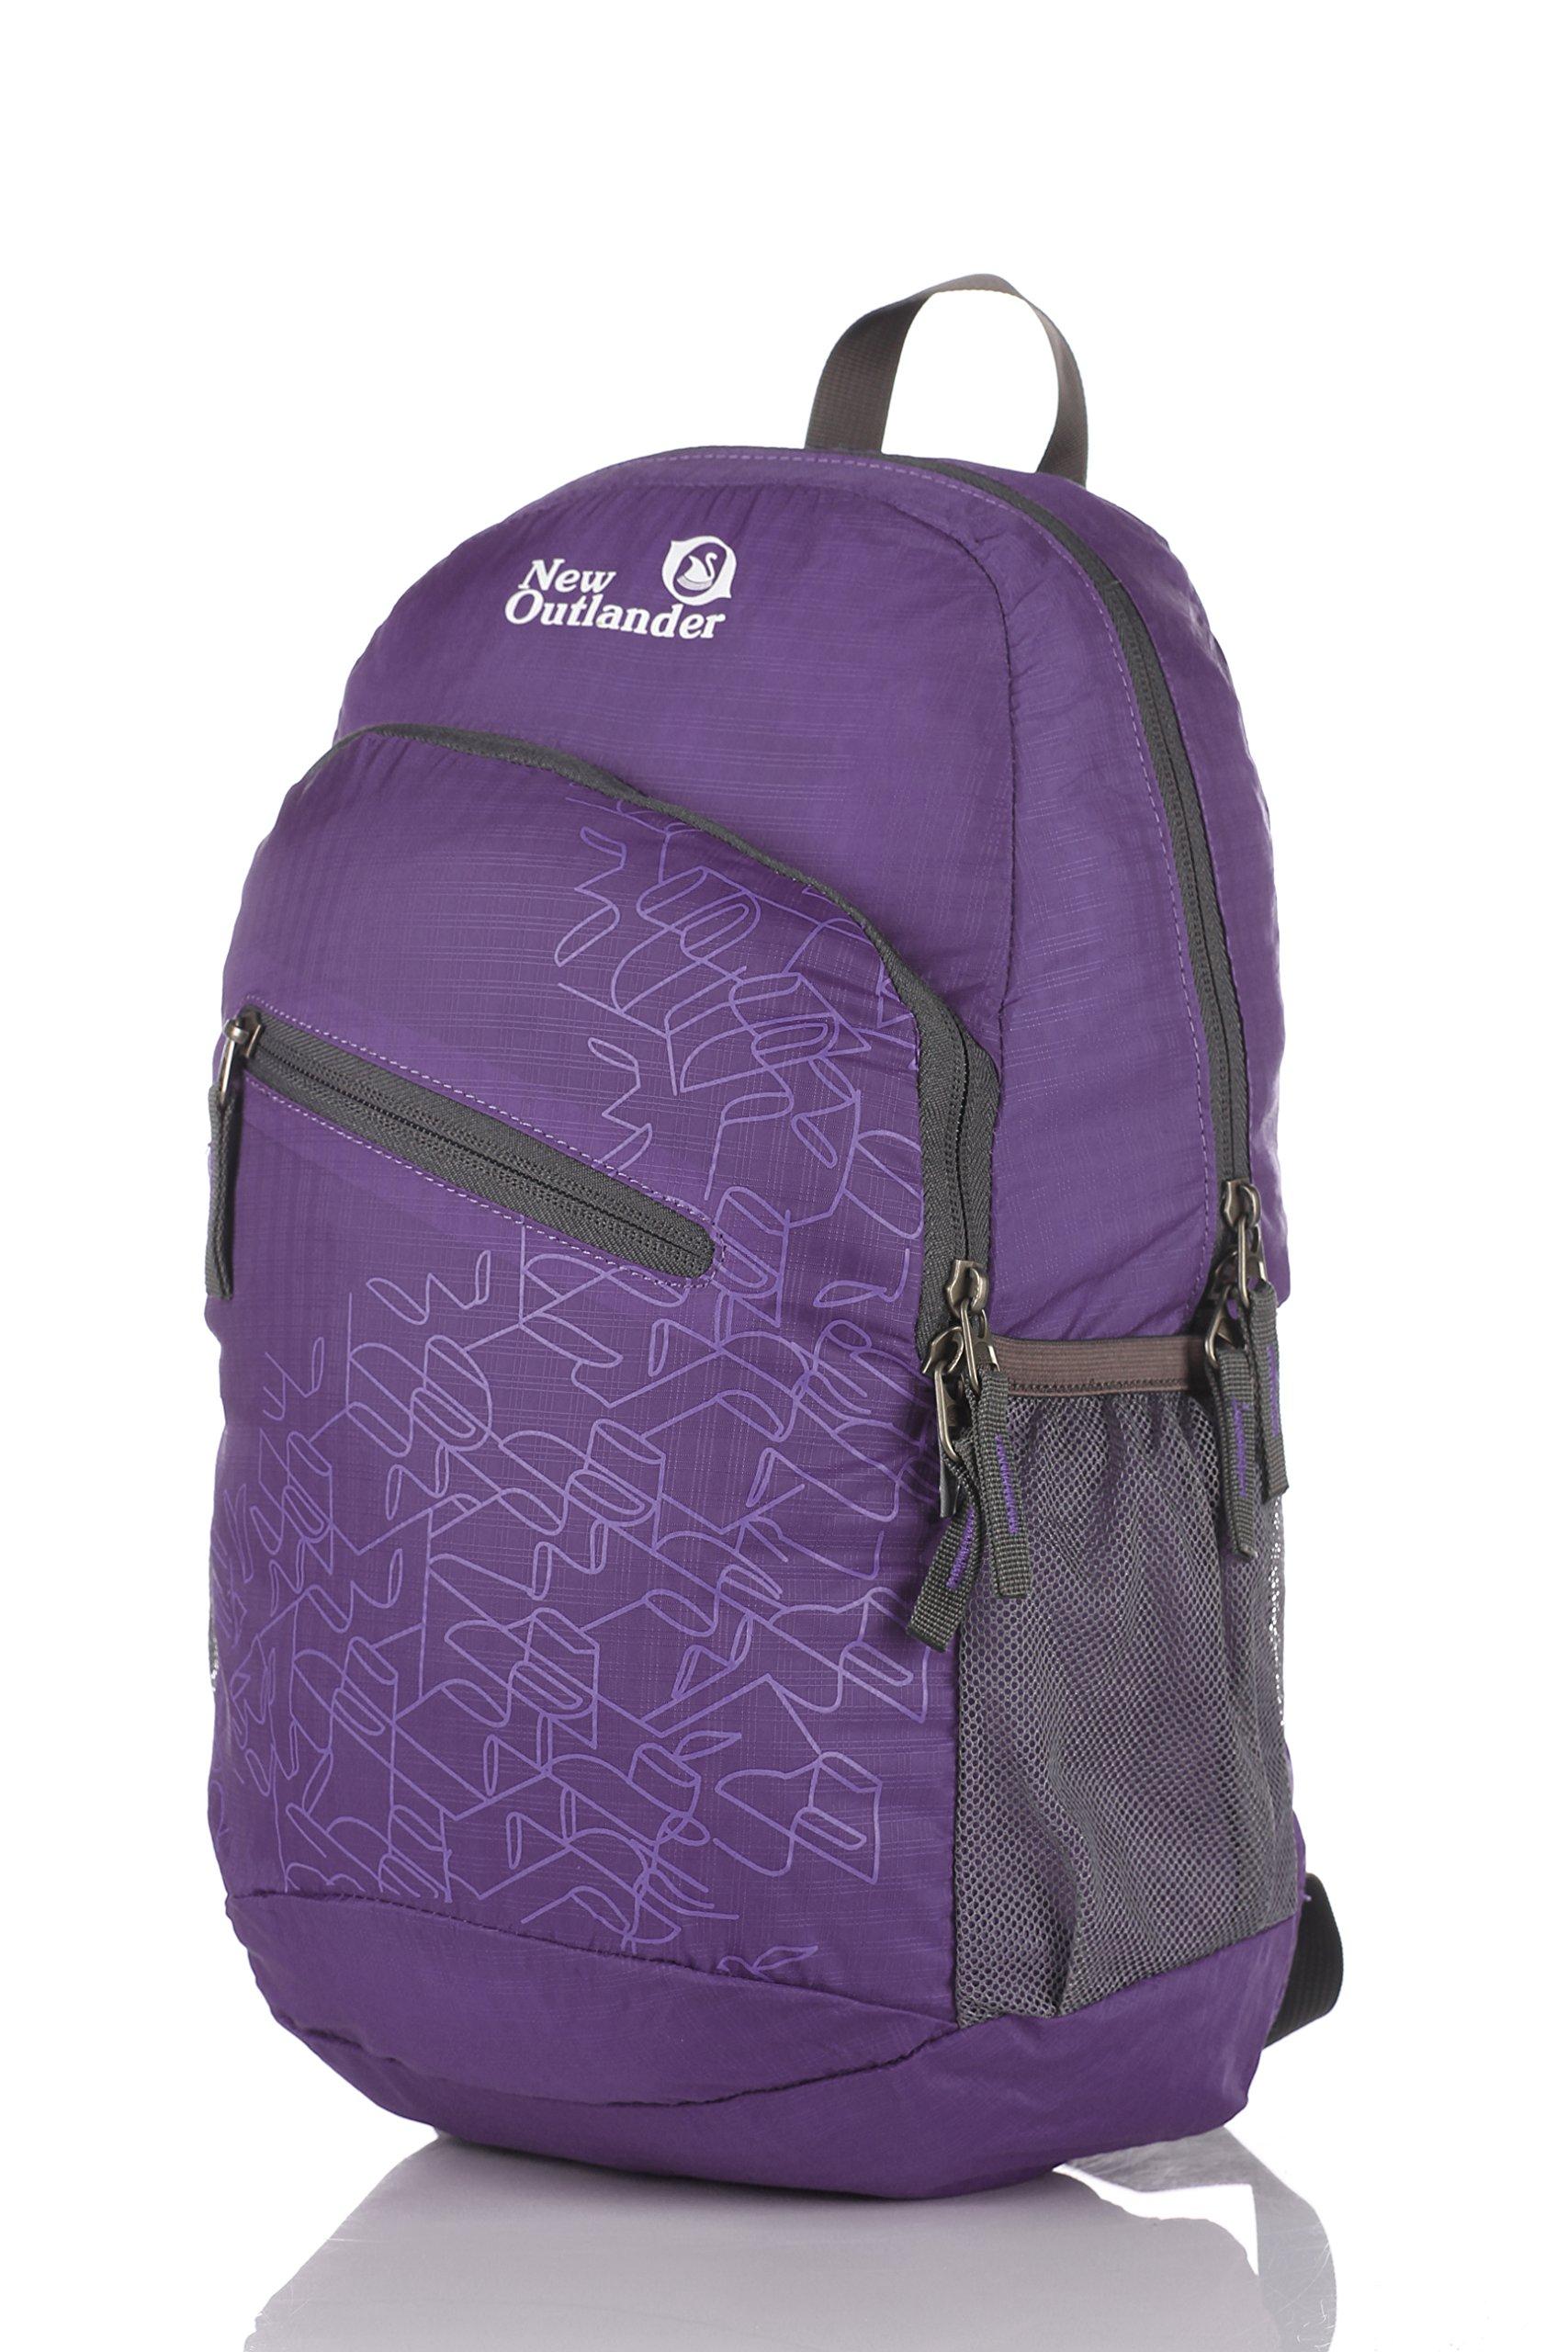 Outlander Packable Handy Lightweight Travel Hiking Backpack Daypack-Purple-L by Outlander (Image #2)